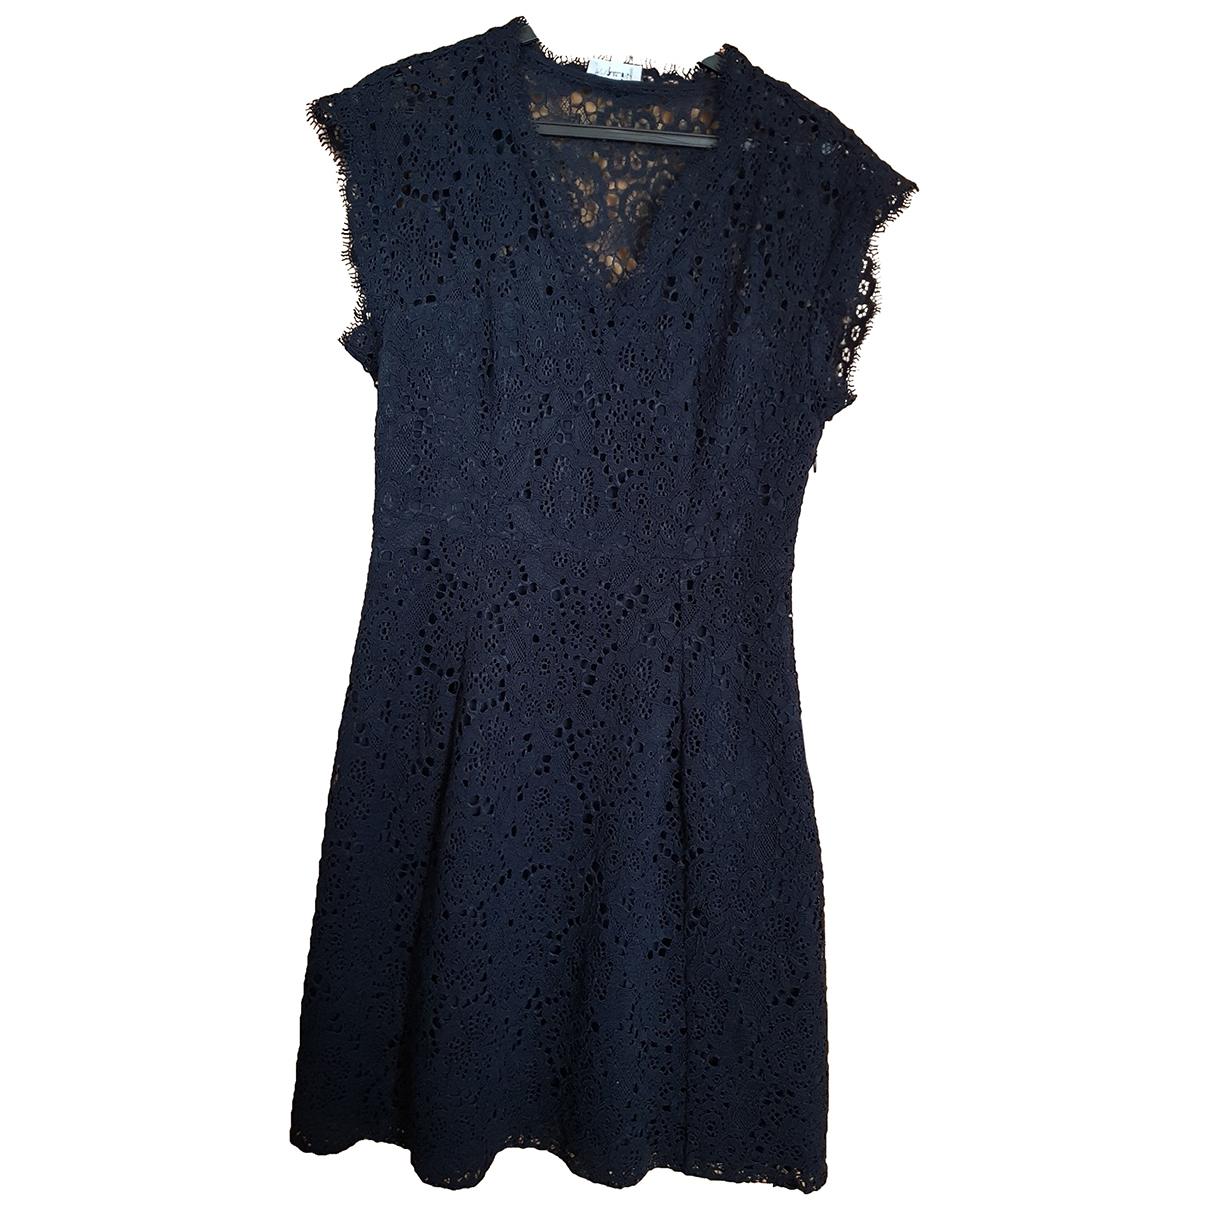 Claudie Pierlot Spring Summer 2019 Navy Cotton dress for Women 38 FR